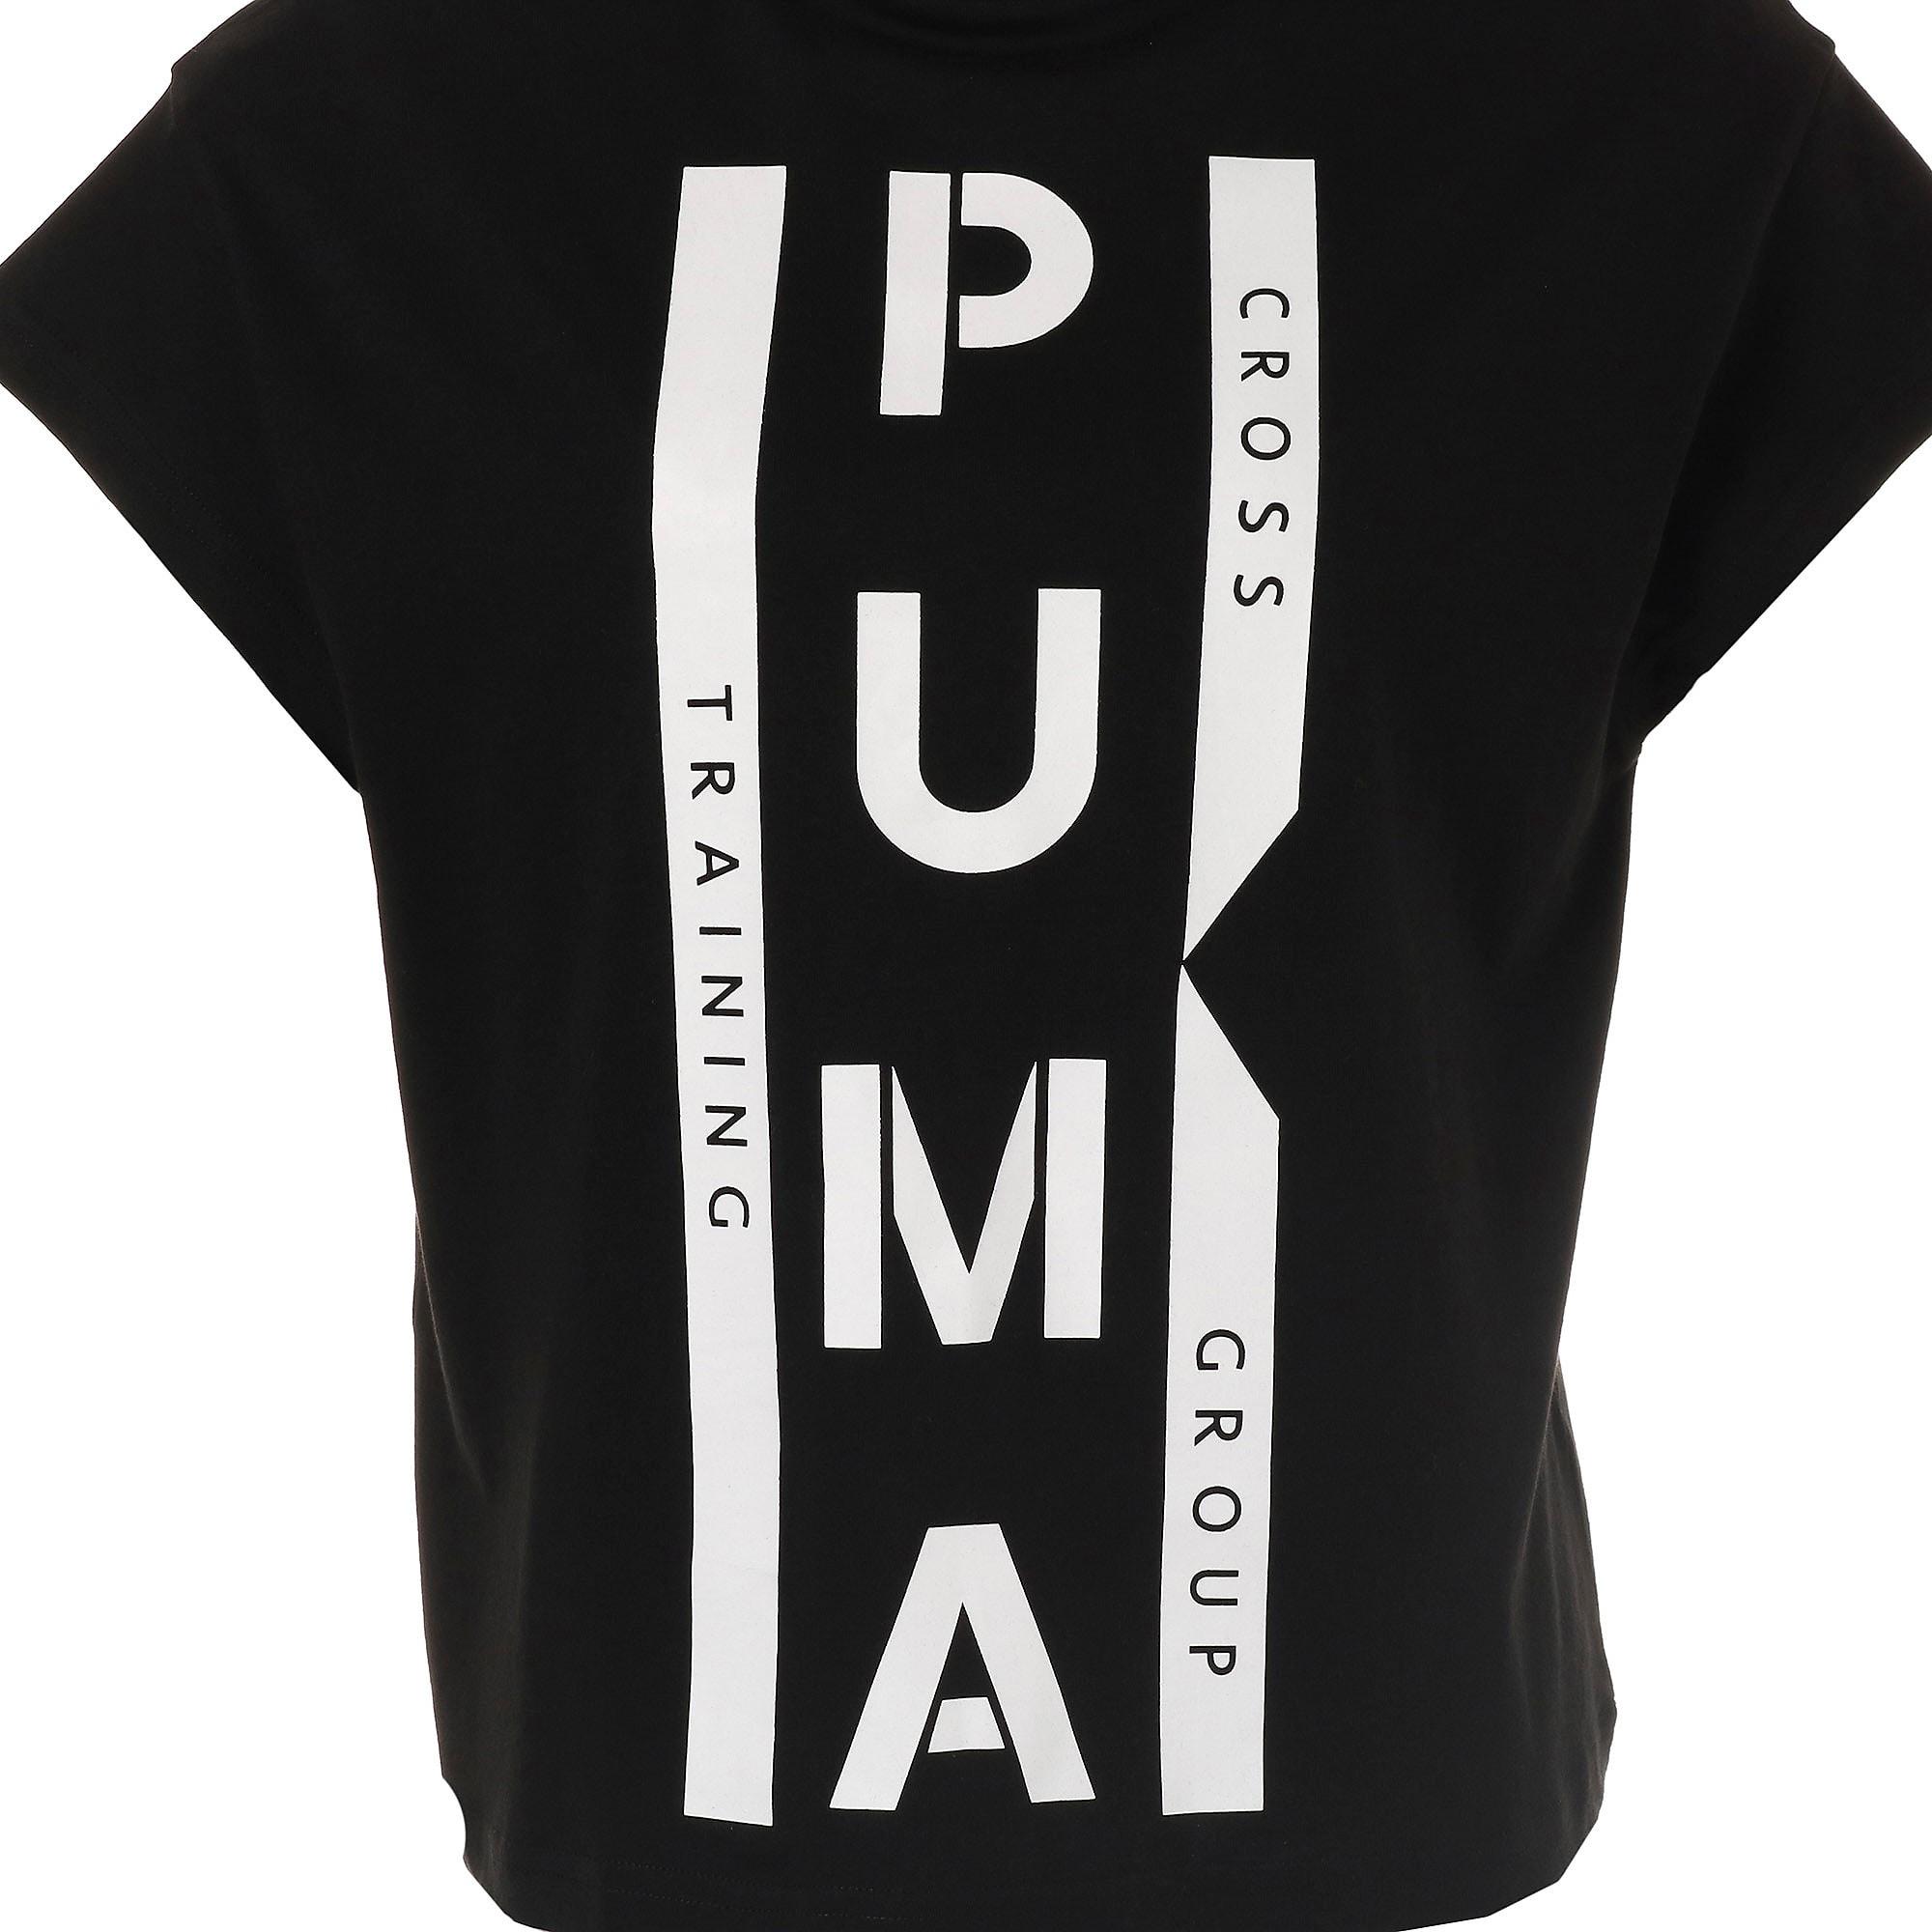 Thumbnail 9 of PUMA XTG グラフィック ウィメンズ SS Tシャツ 半袖, Cotton Black, medium-JPN